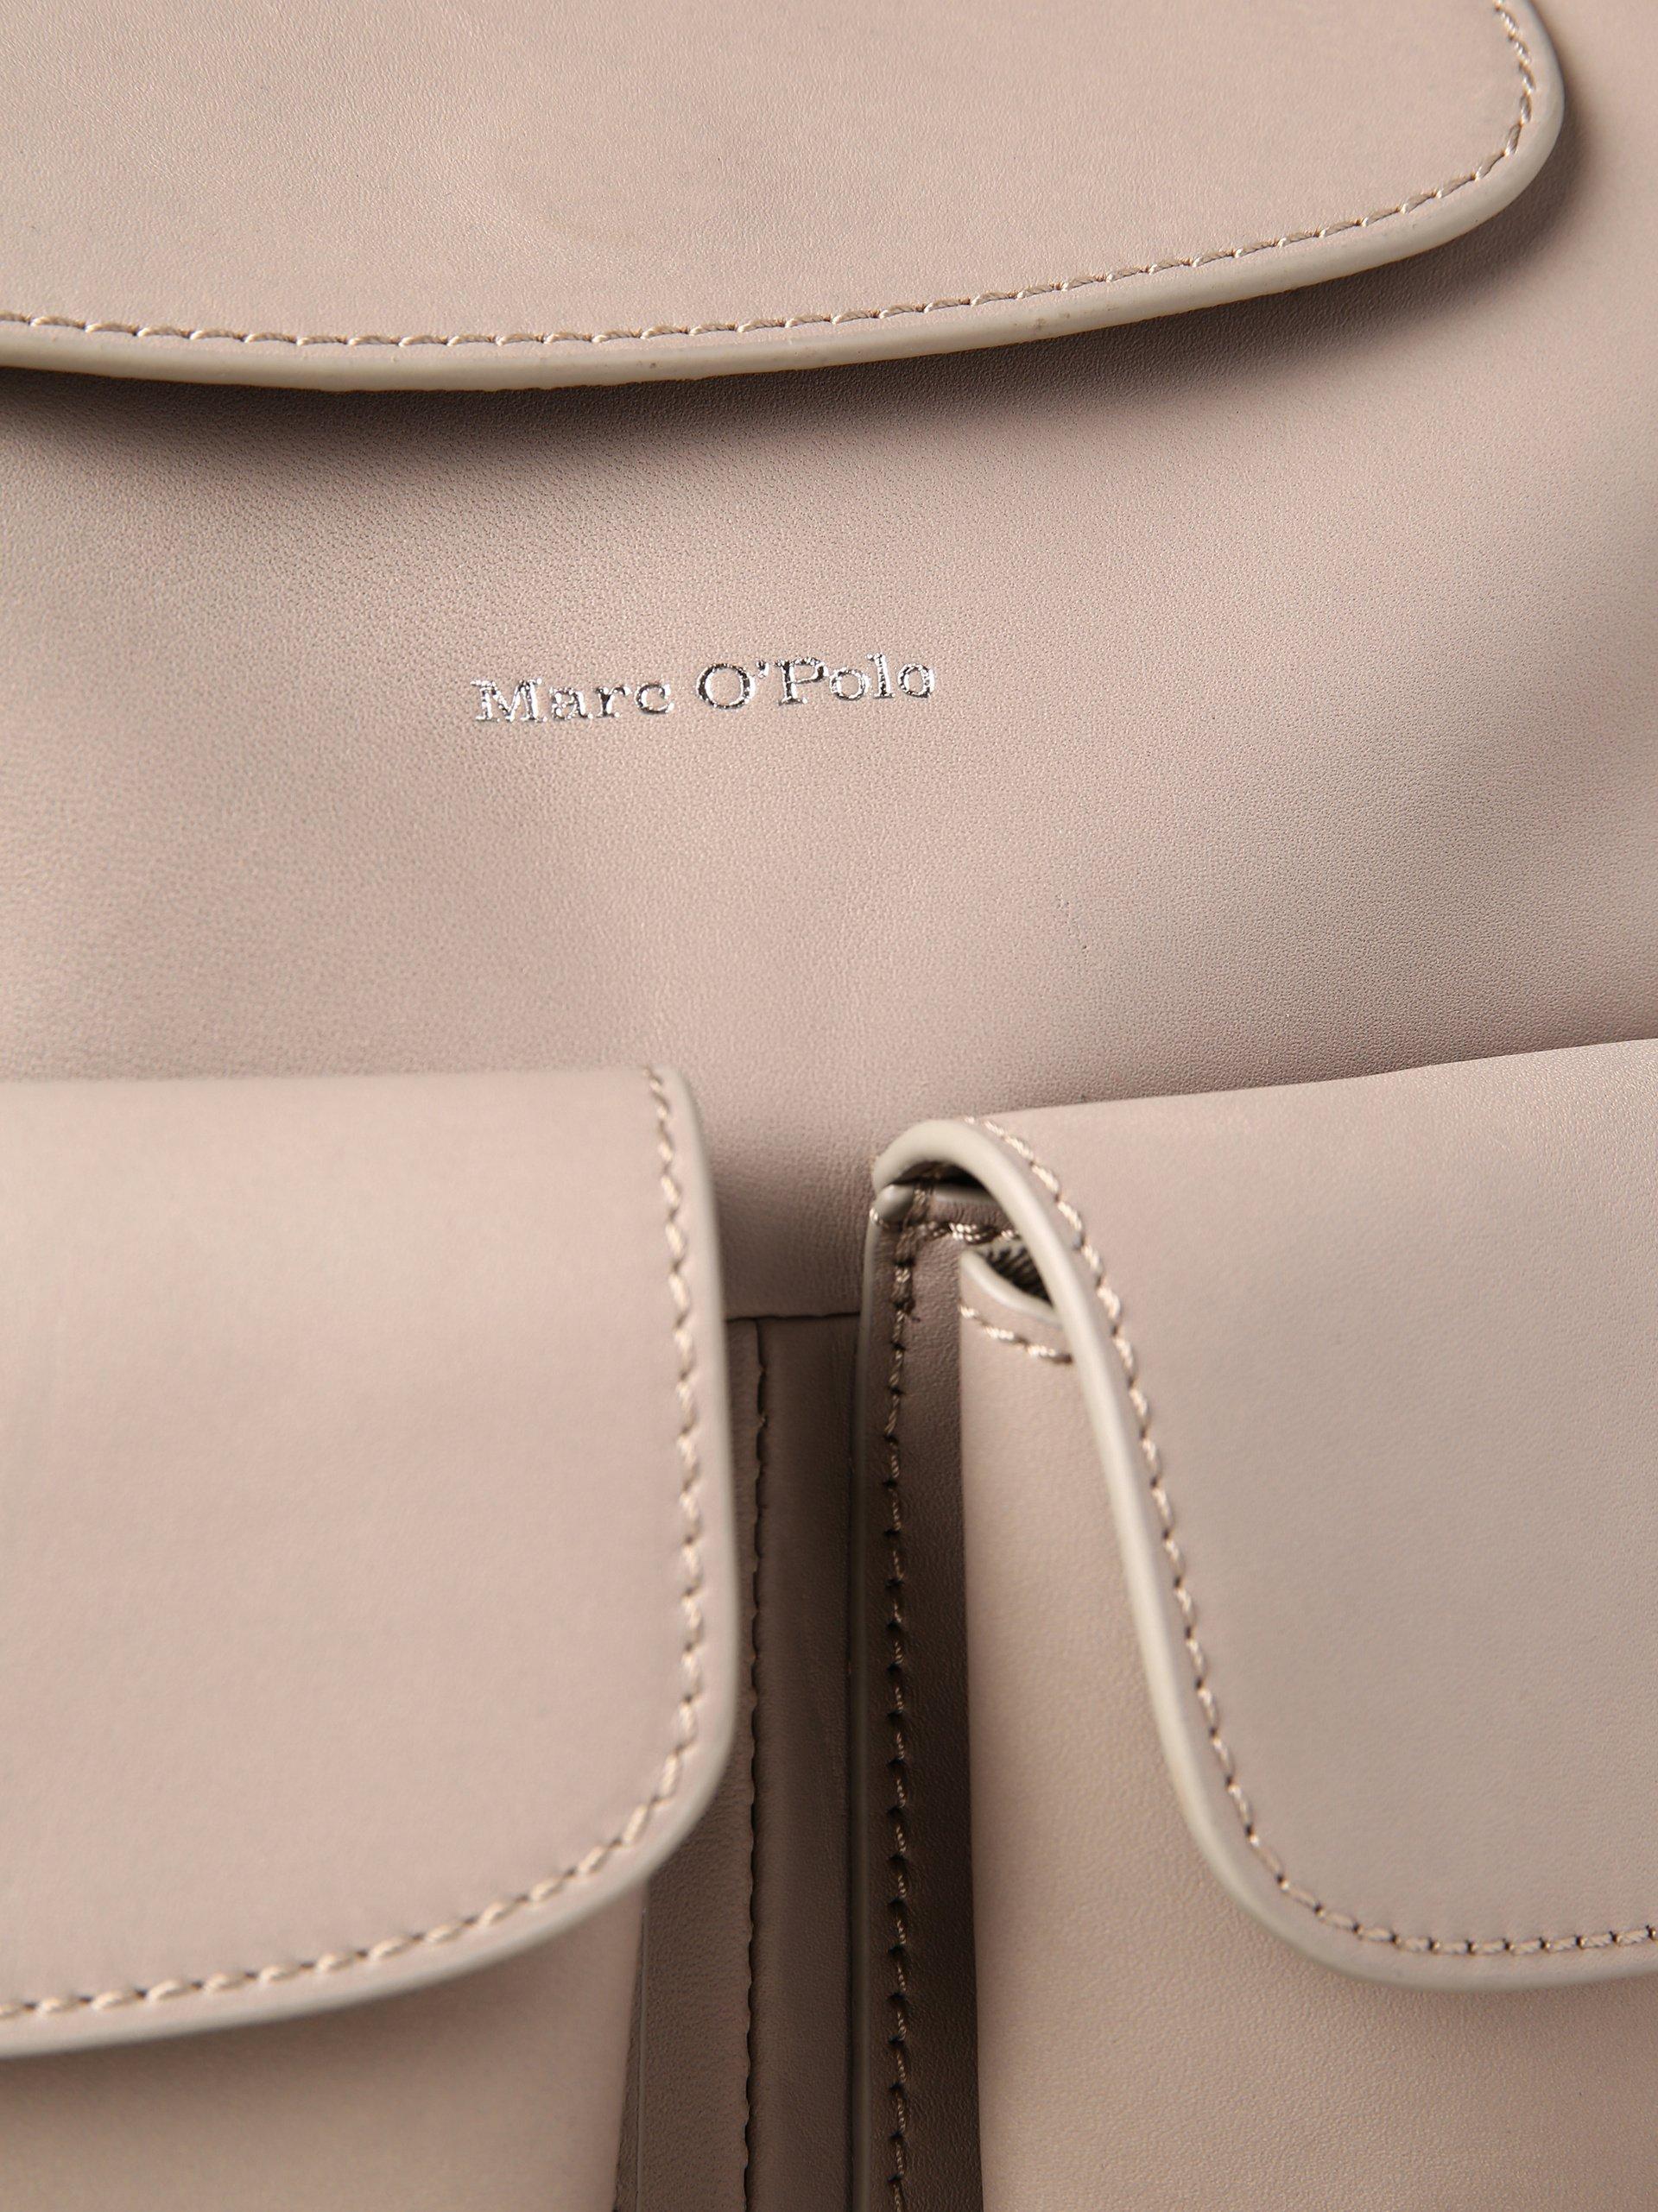 marc o 39 polo damen tasche aus leder grau uni online kaufen peek und cloppenburg de. Black Bedroom Furniture Sets. Home Design Ideas